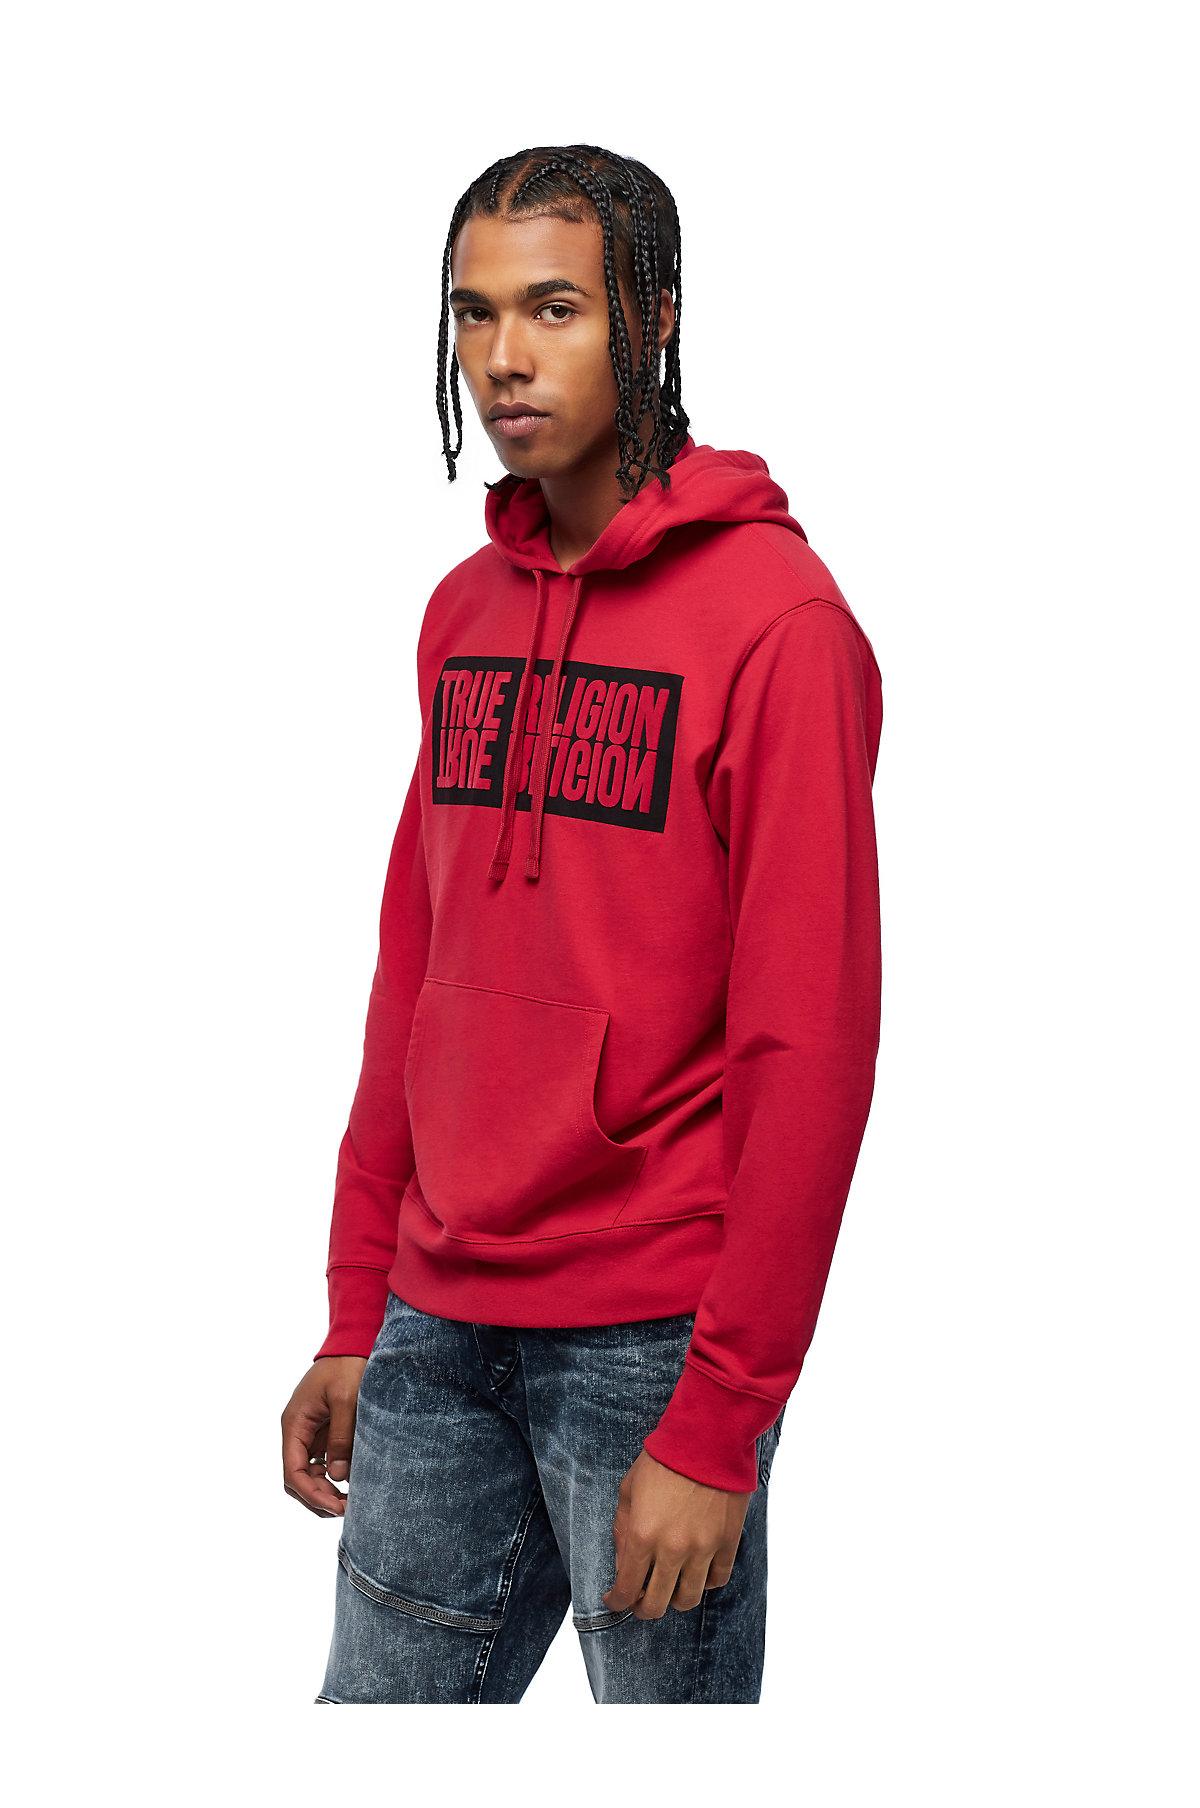 True-Religion-Men-039-s-Mirror-Logo-Reflection-Pullover-Hoodie-Sweatshirt thumbnail 3